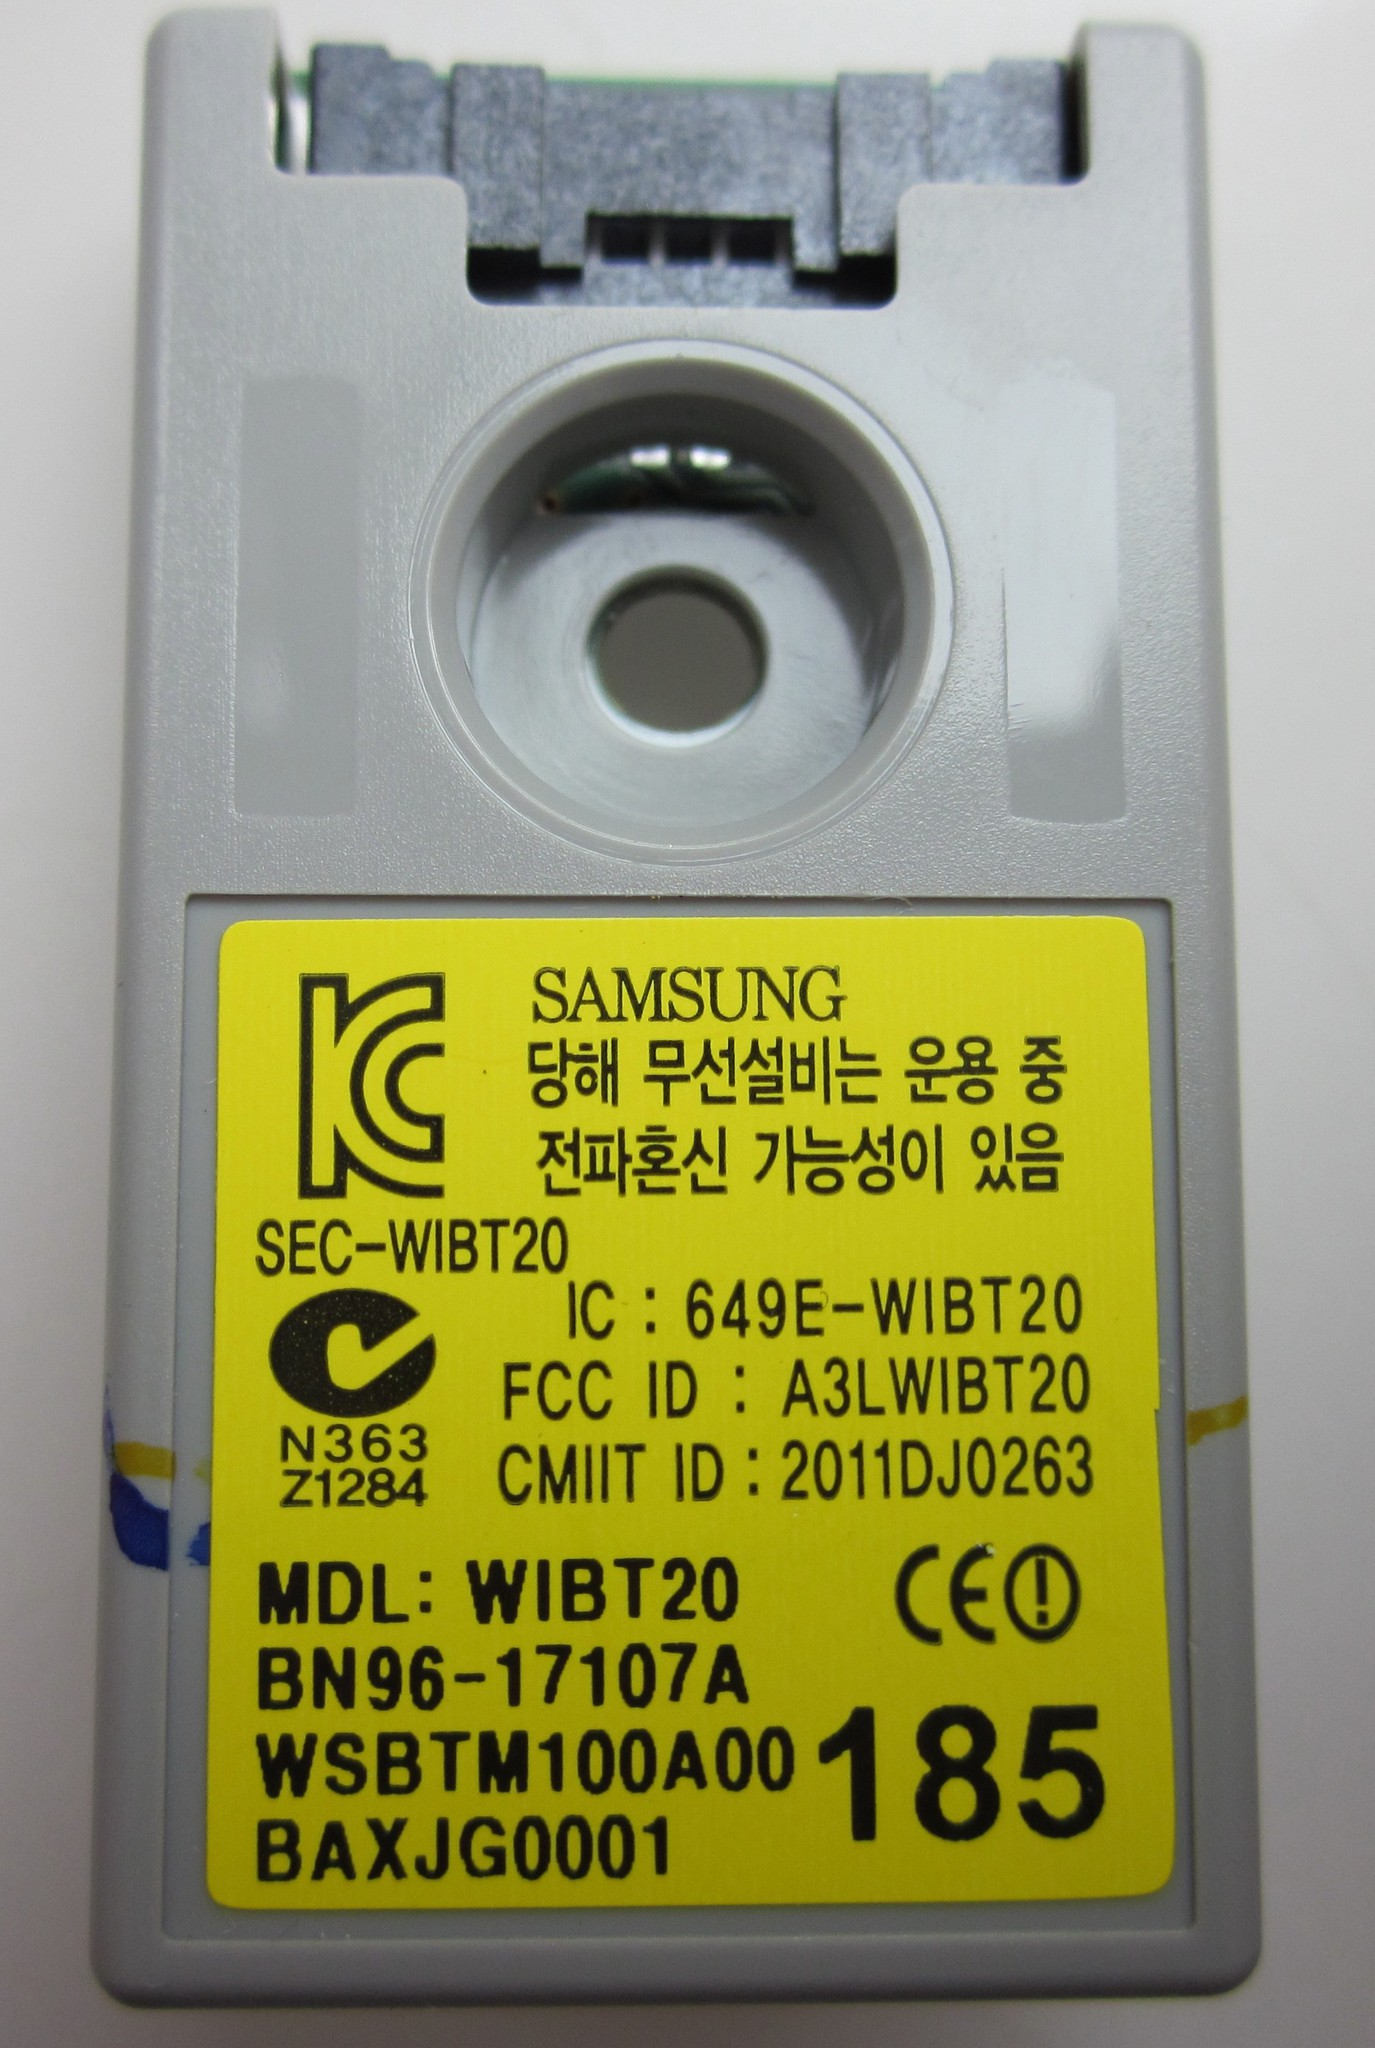 BN96-17107A Bluetooth Module